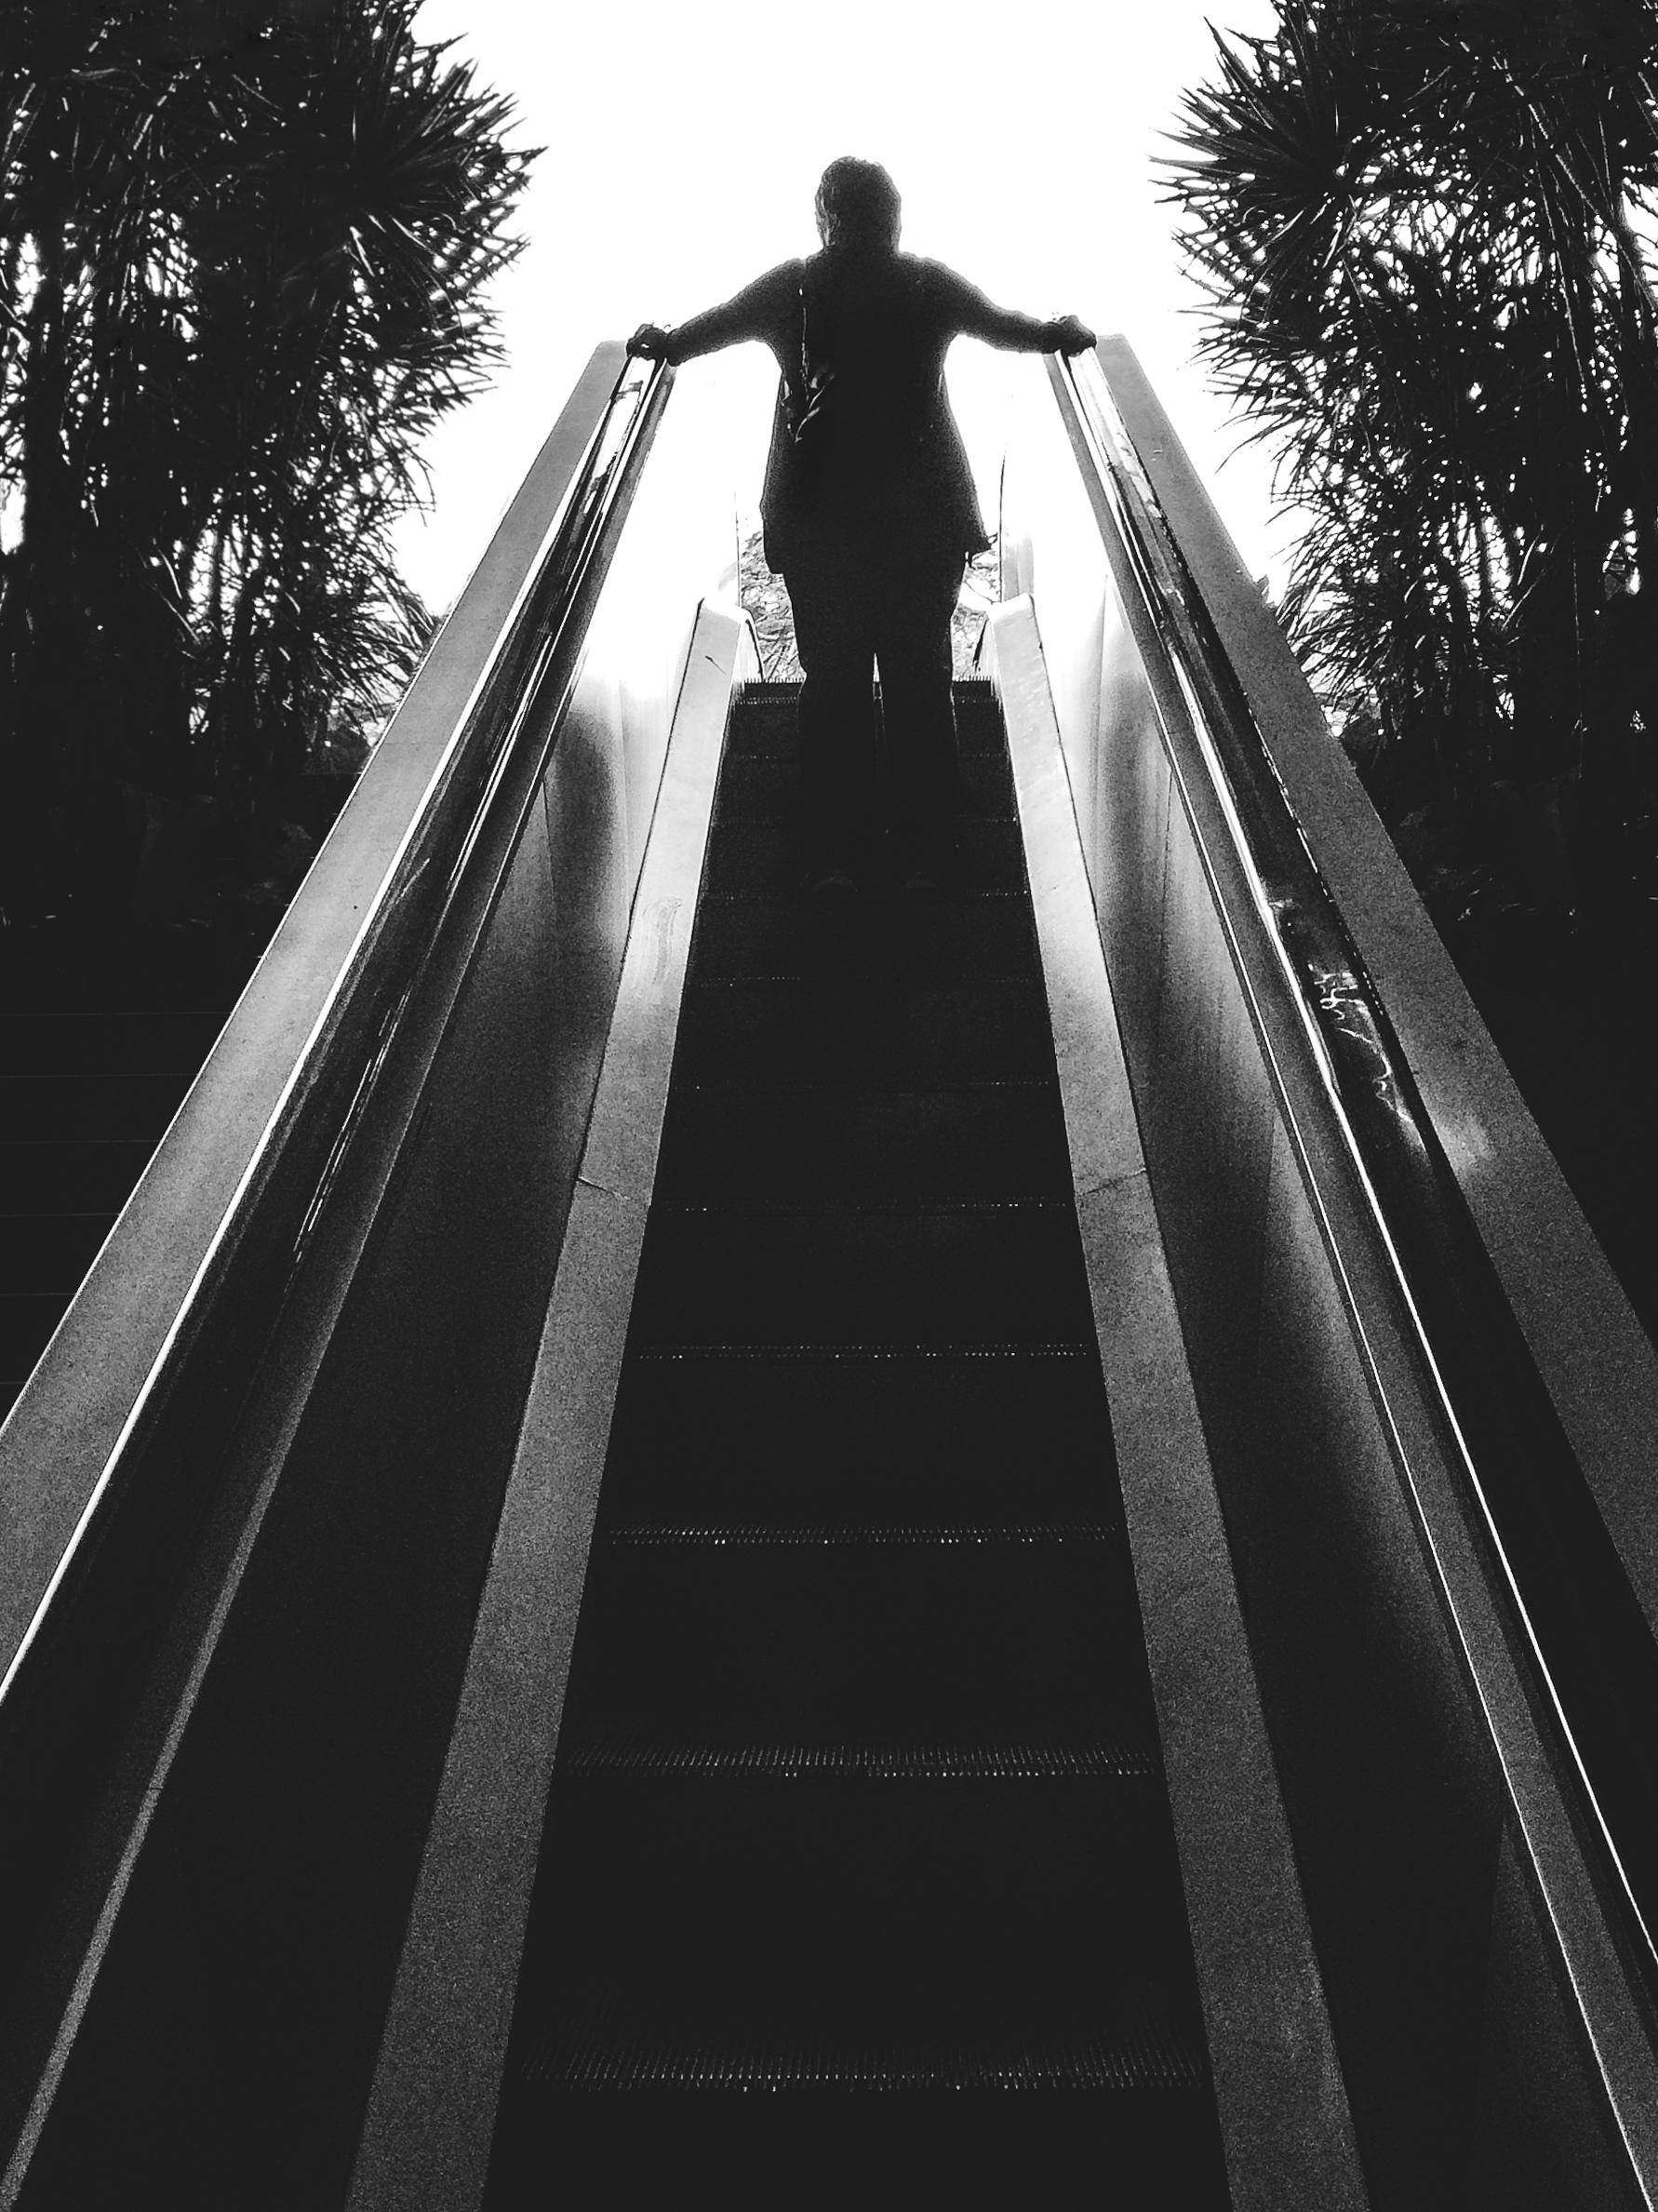 / Ascending